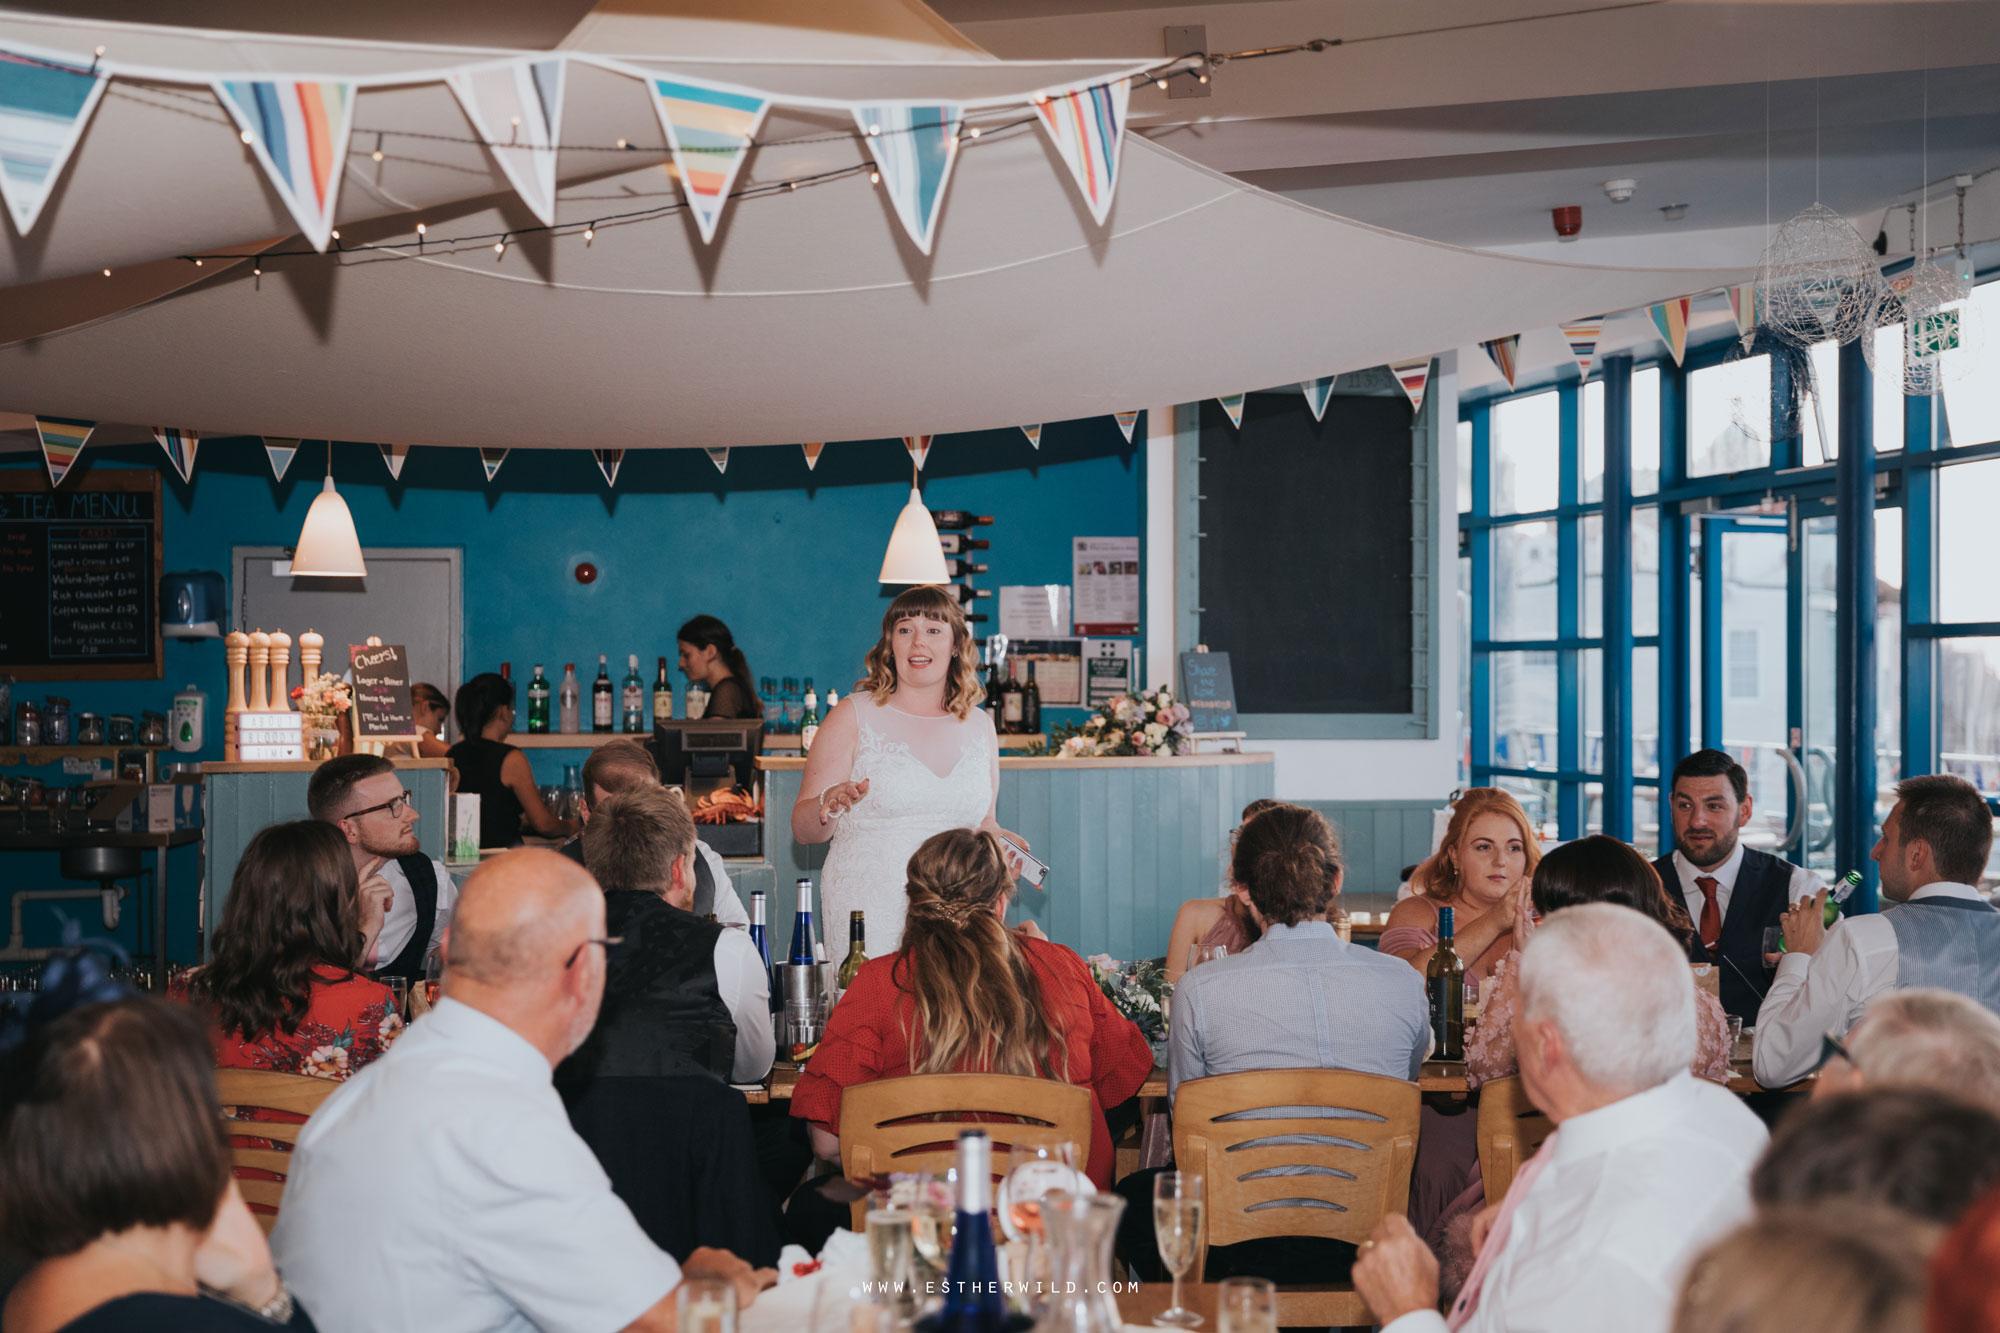 Cromer_Wedding_Beach_Outdoor_Ceremony_Norfolk_North_Lodge_Registry_Office_Rocket_House_Cafe_Cromer_Pier_IMG_5155.jpg